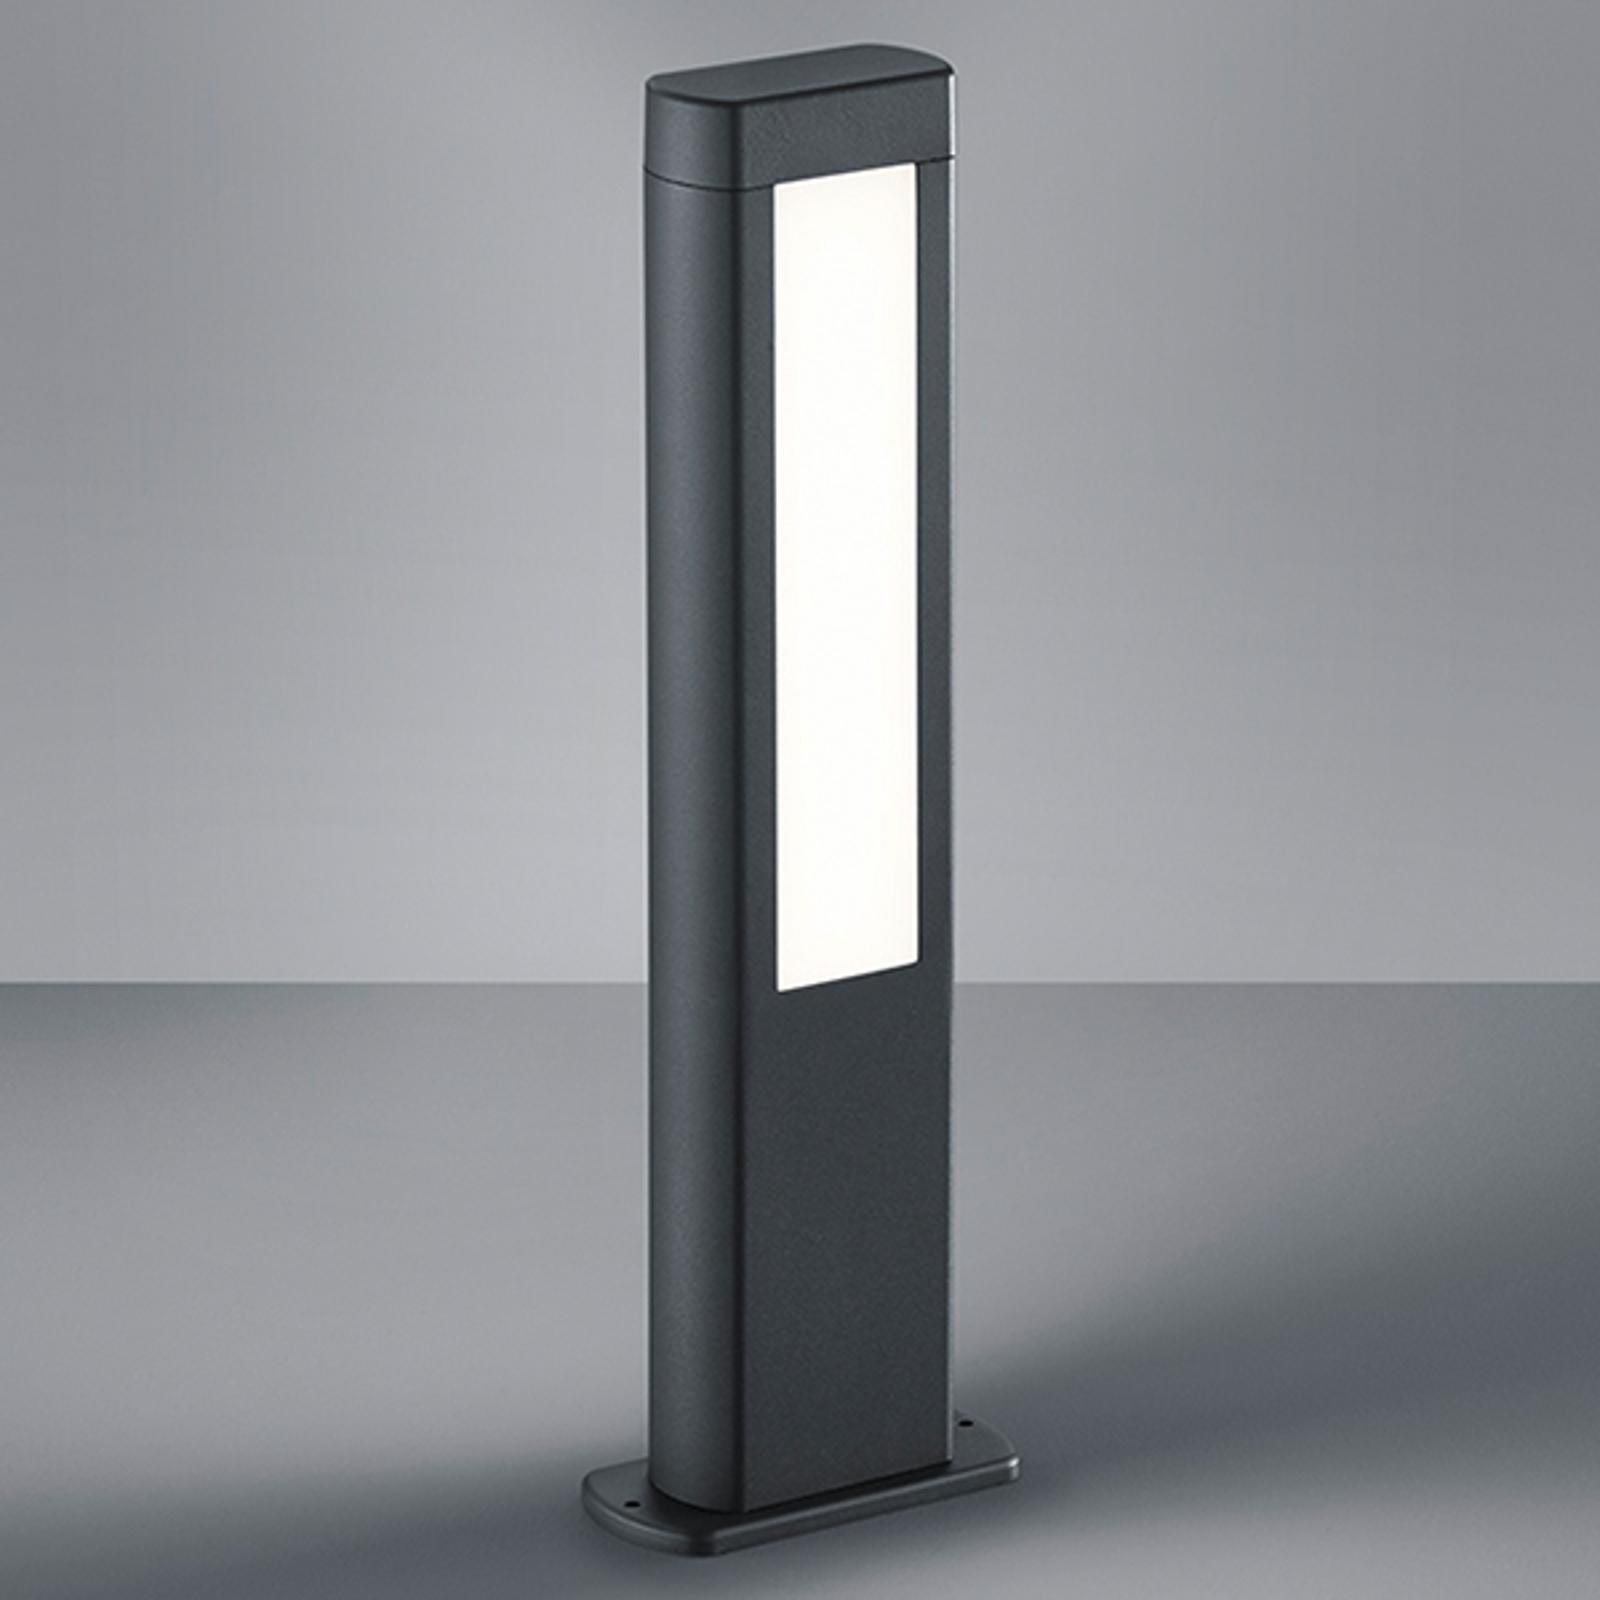 Höhe 50 cm - LED-Sockelleuchte Rhine